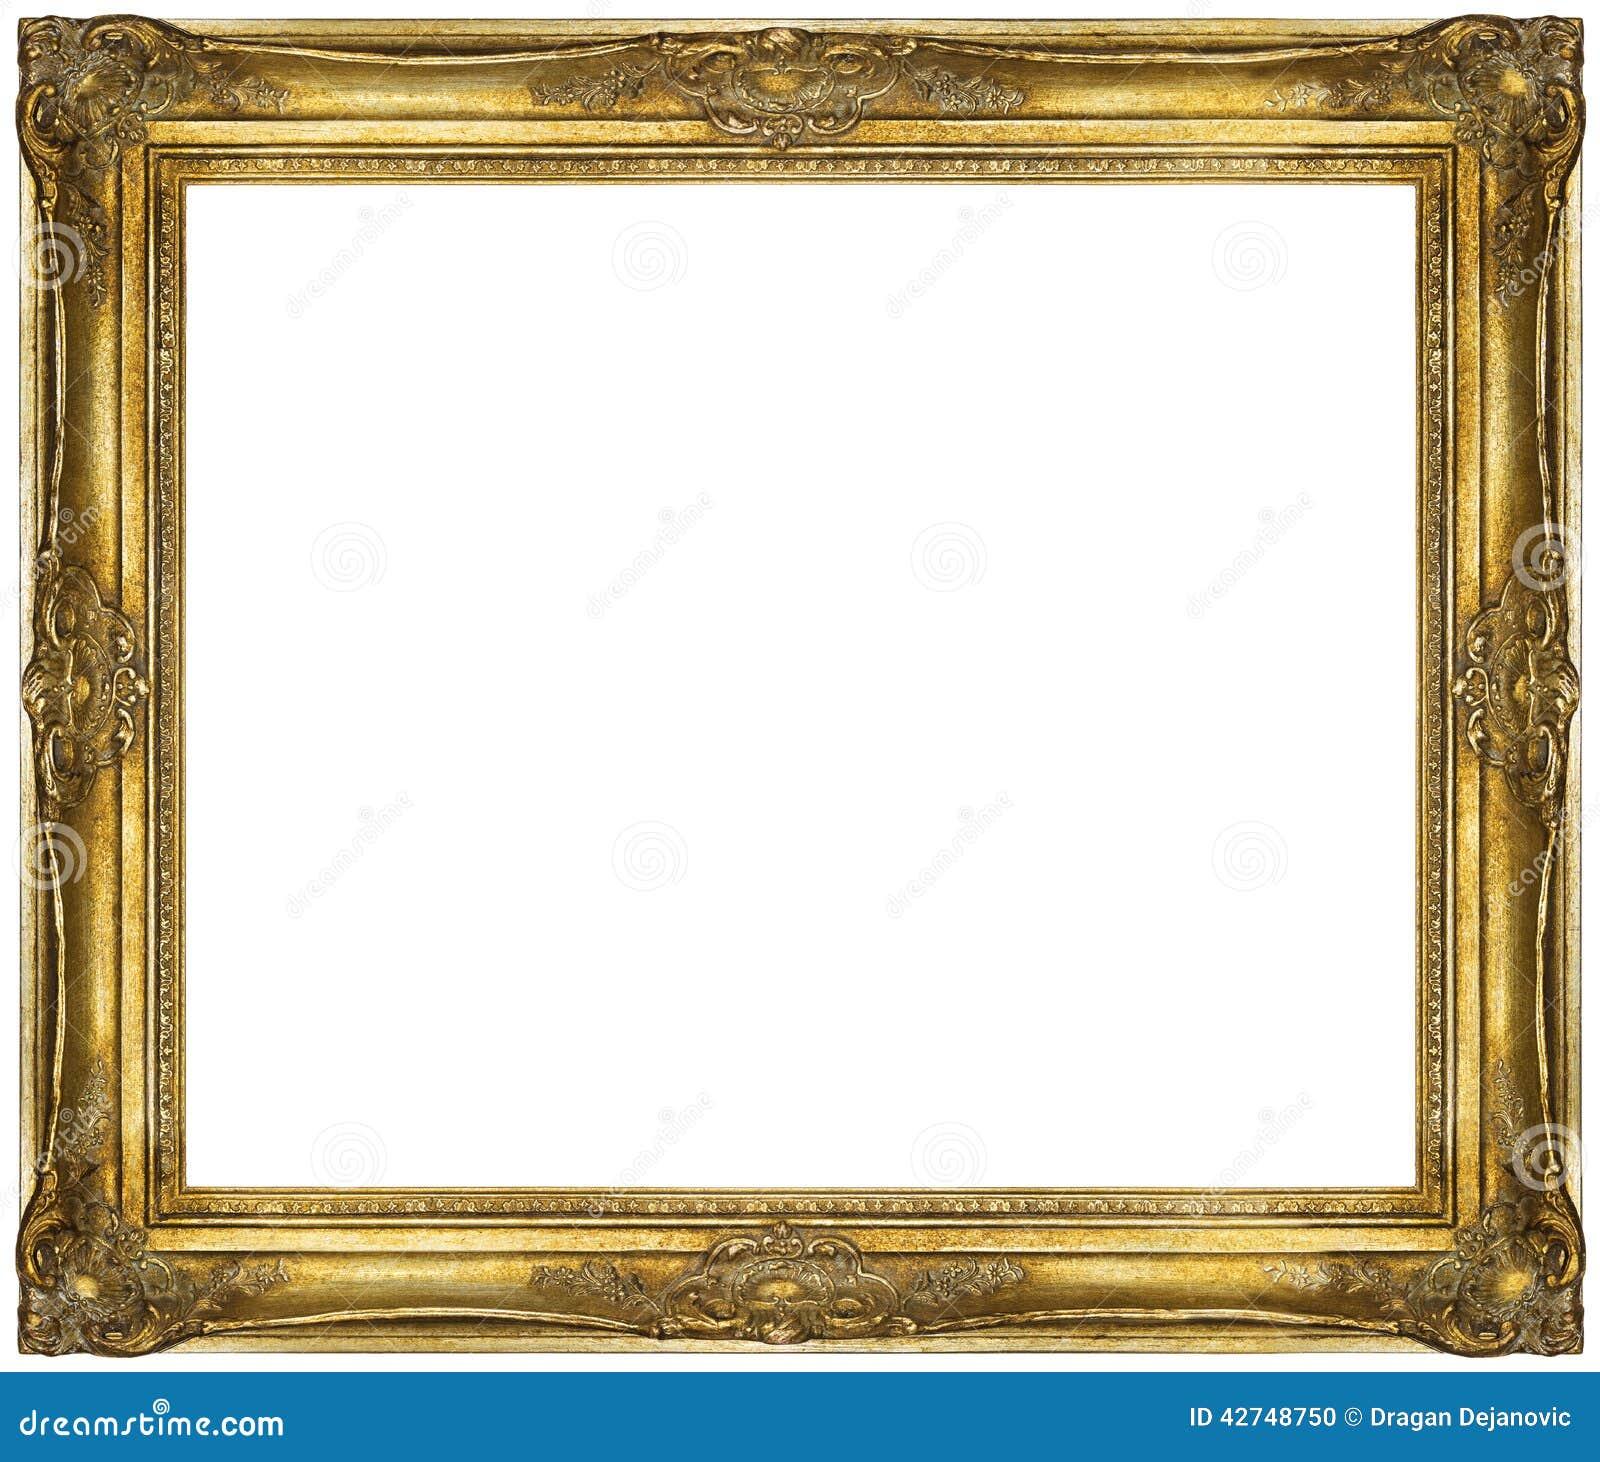 gilded frame restored to its original condition. Modern living antique ...